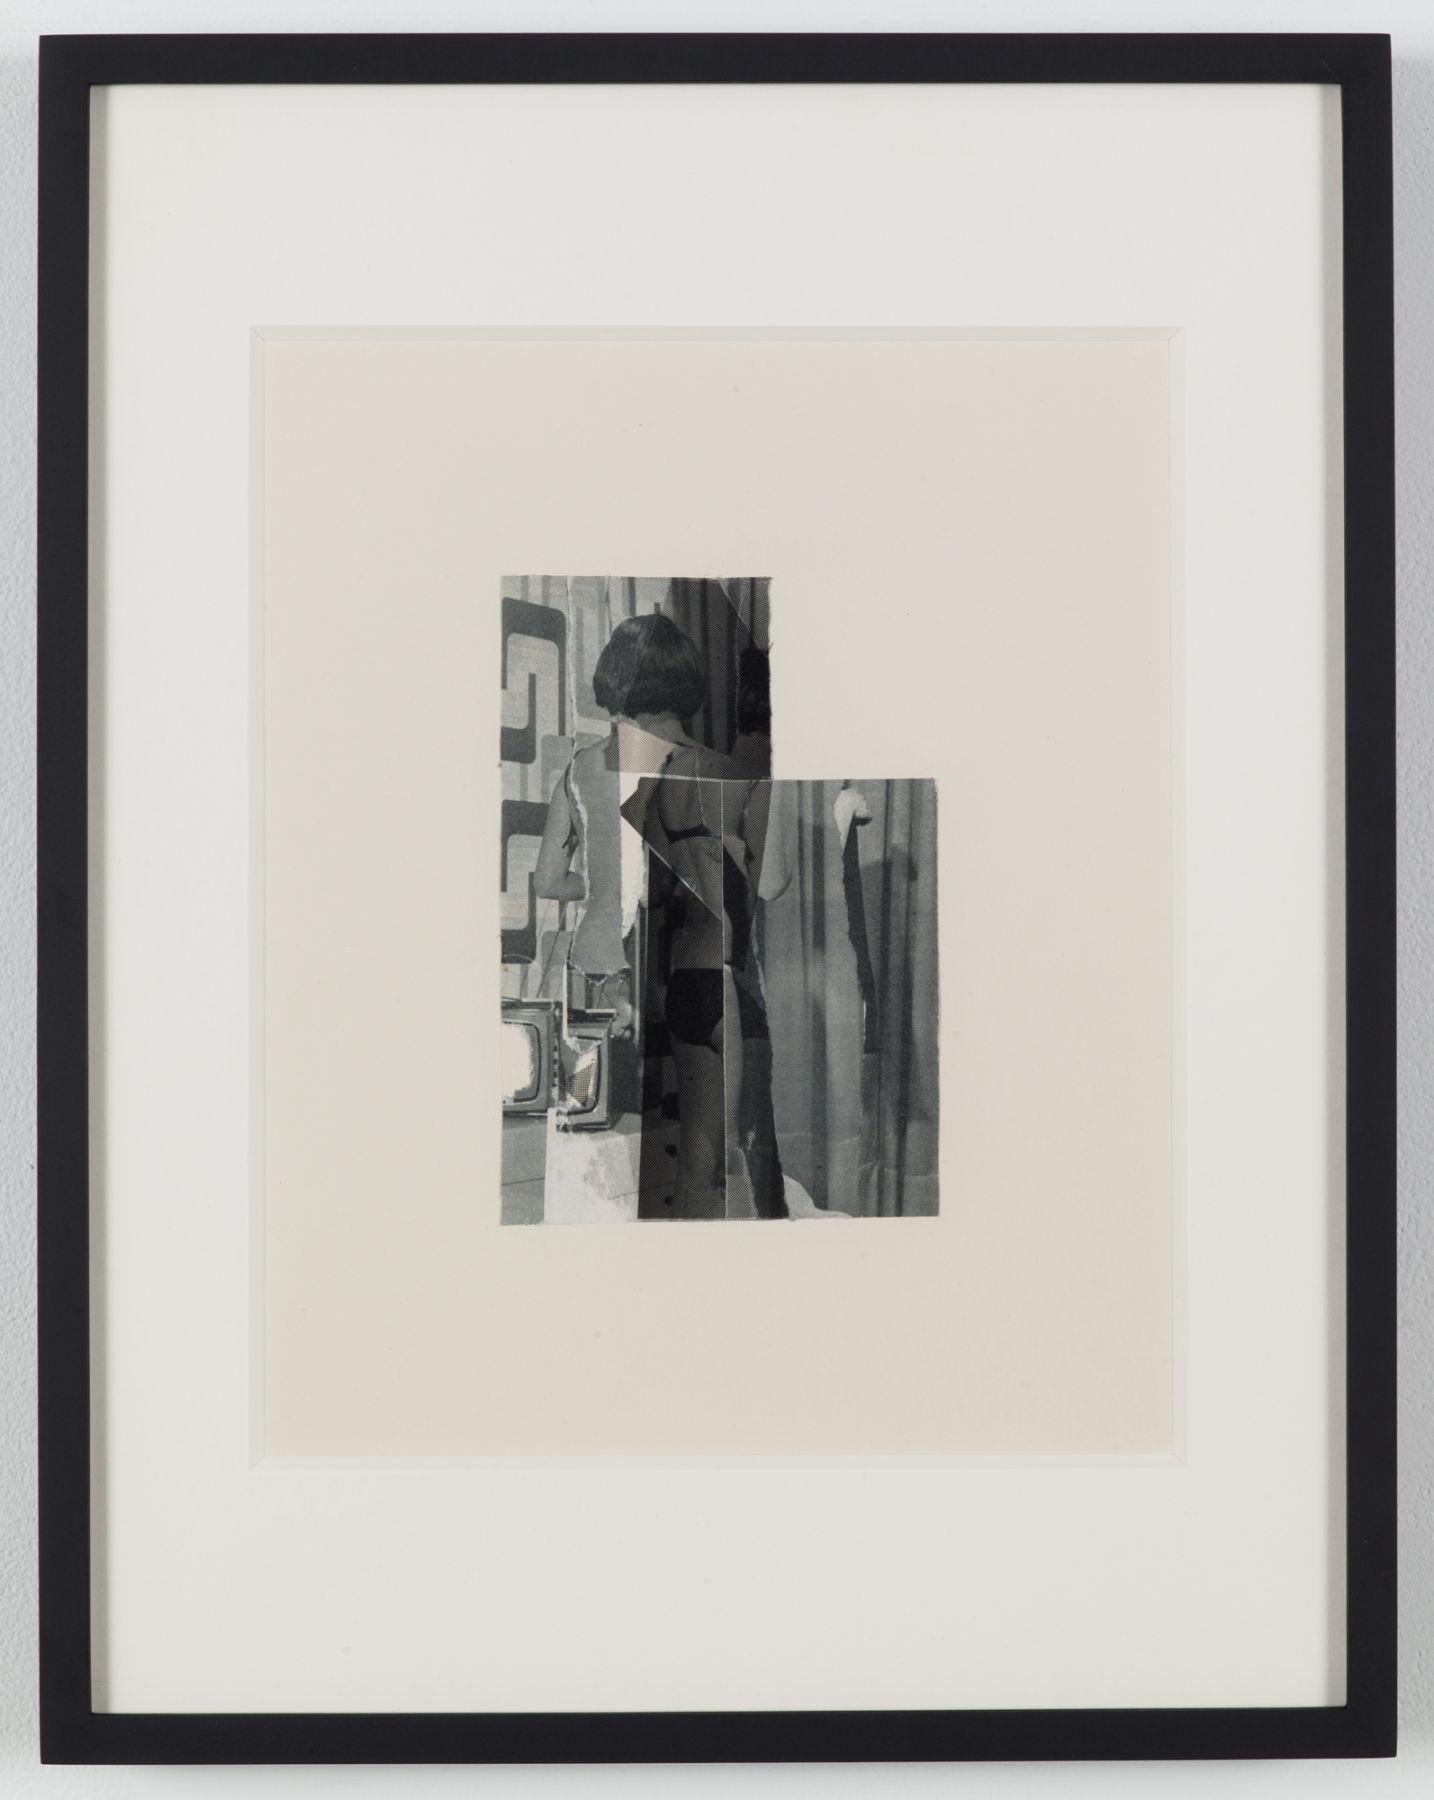 John Stezaker, Untitled